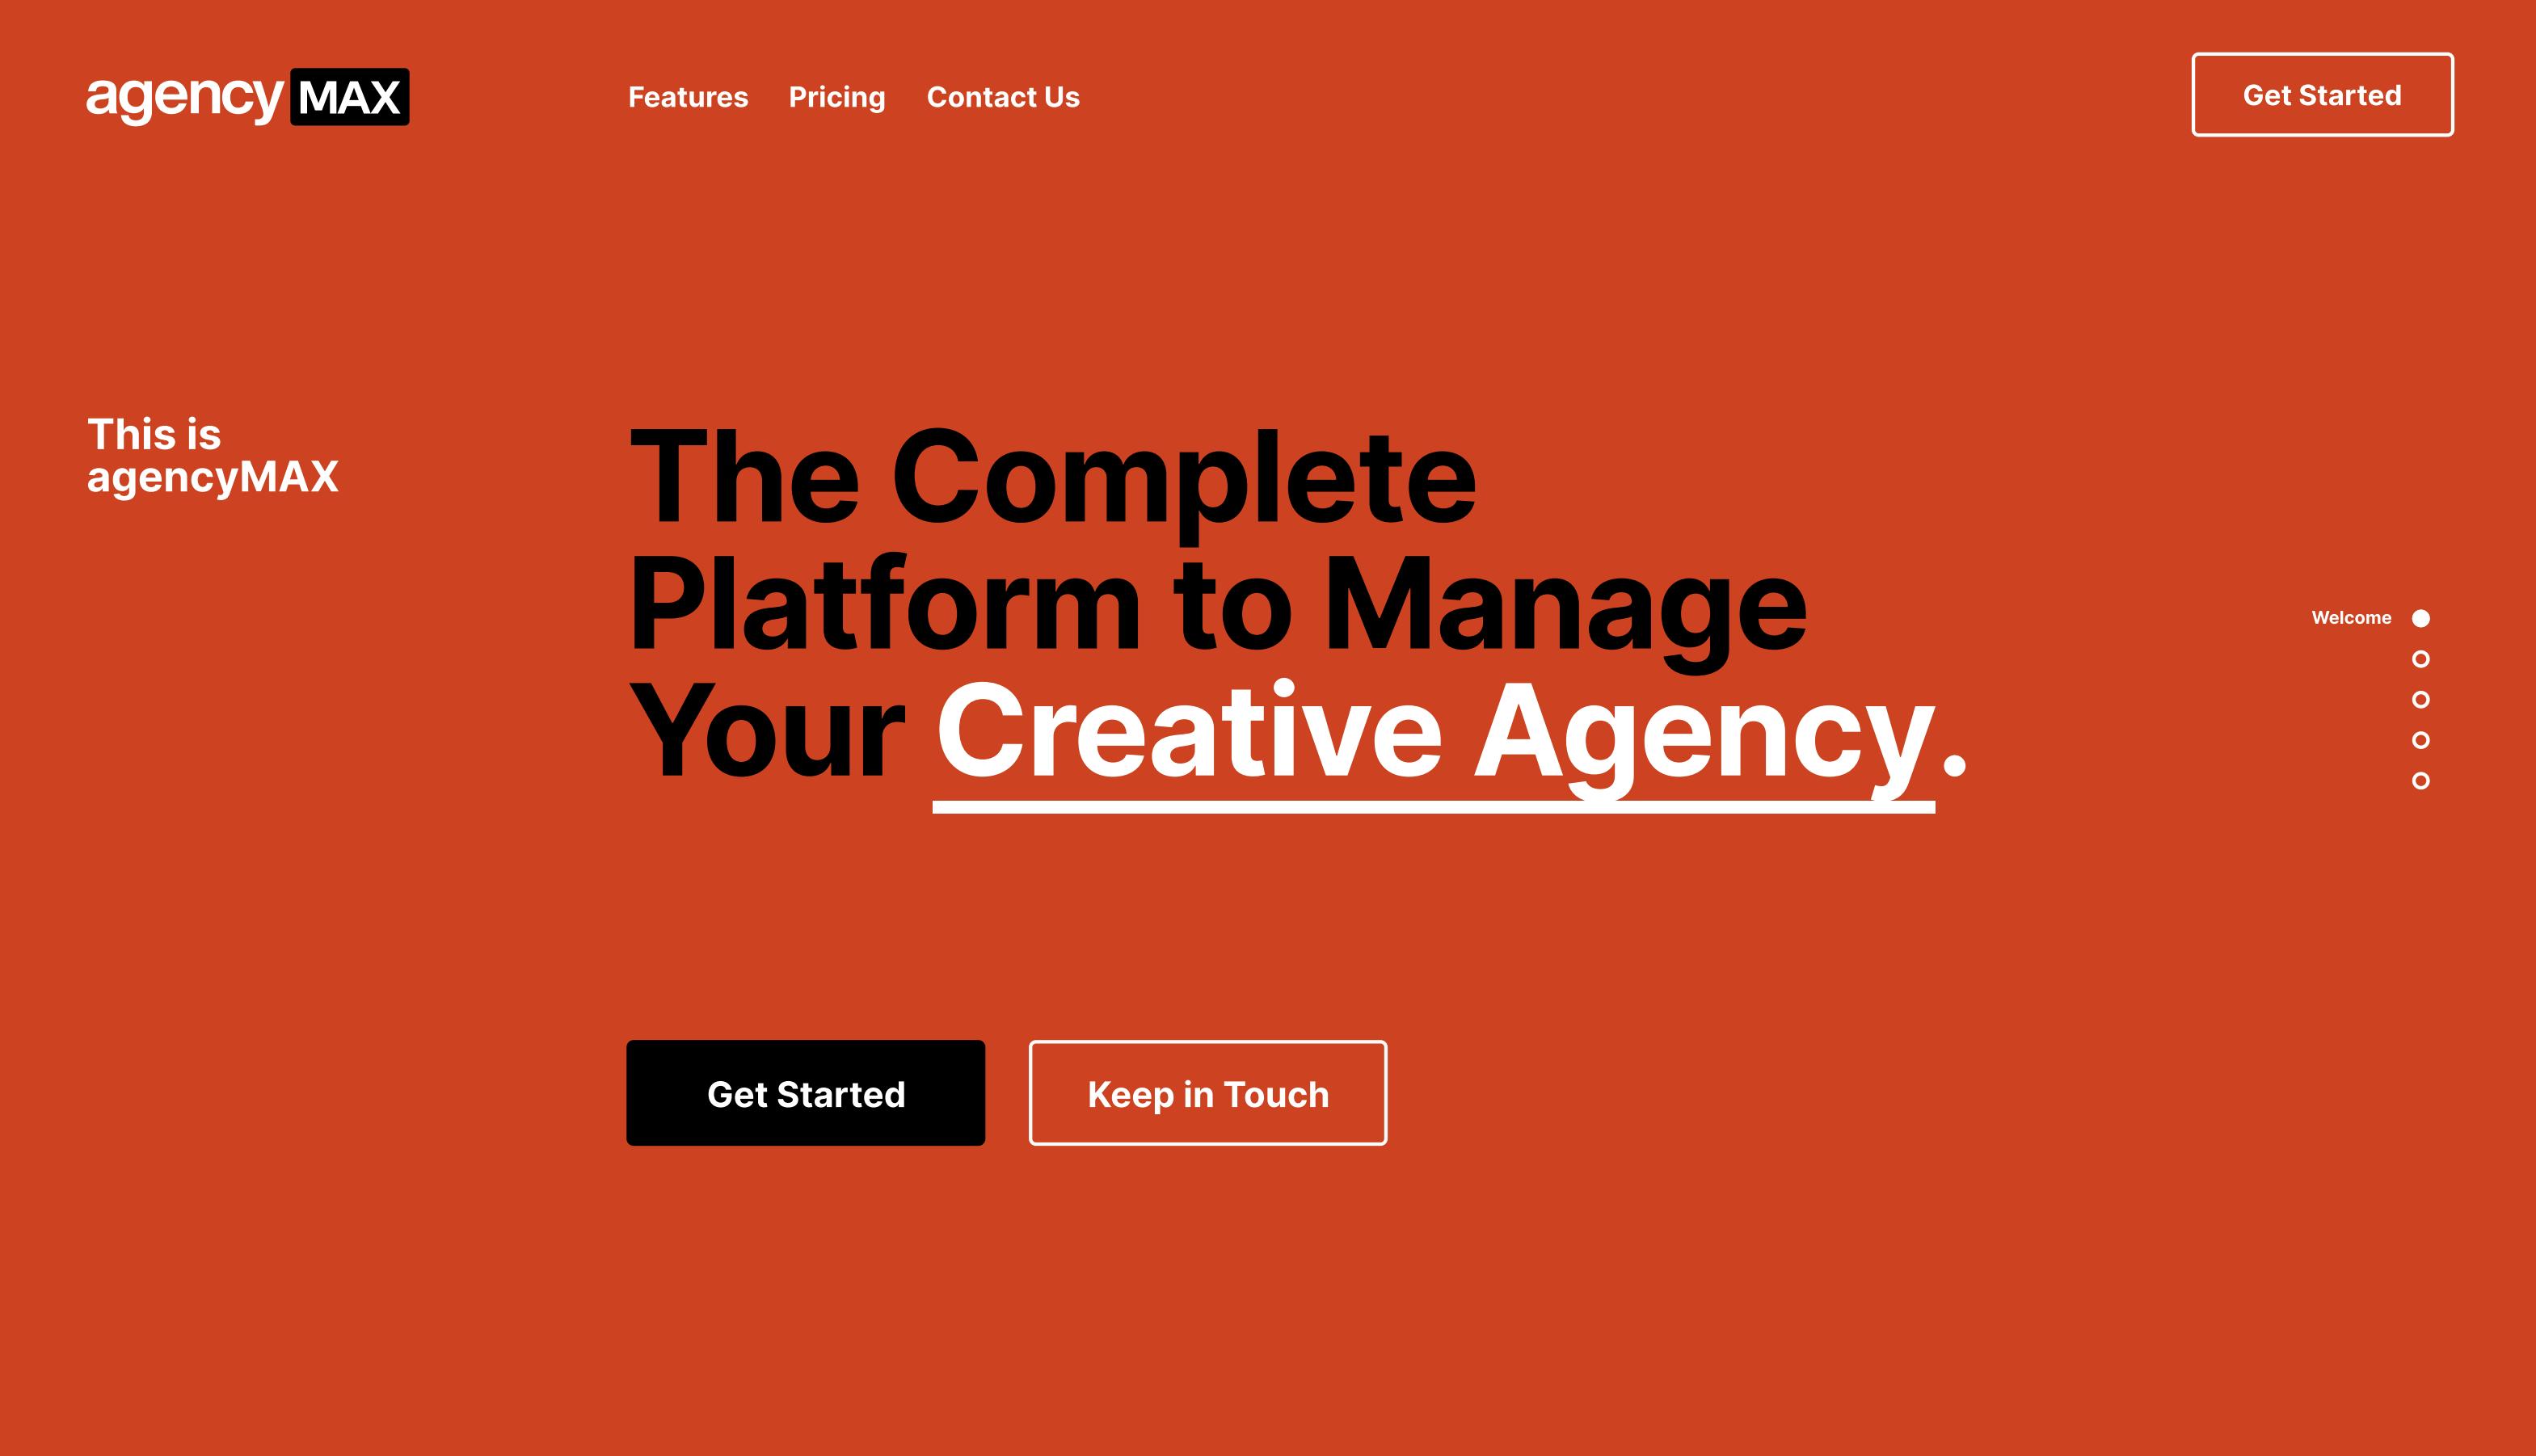 Introducing agencyMAX